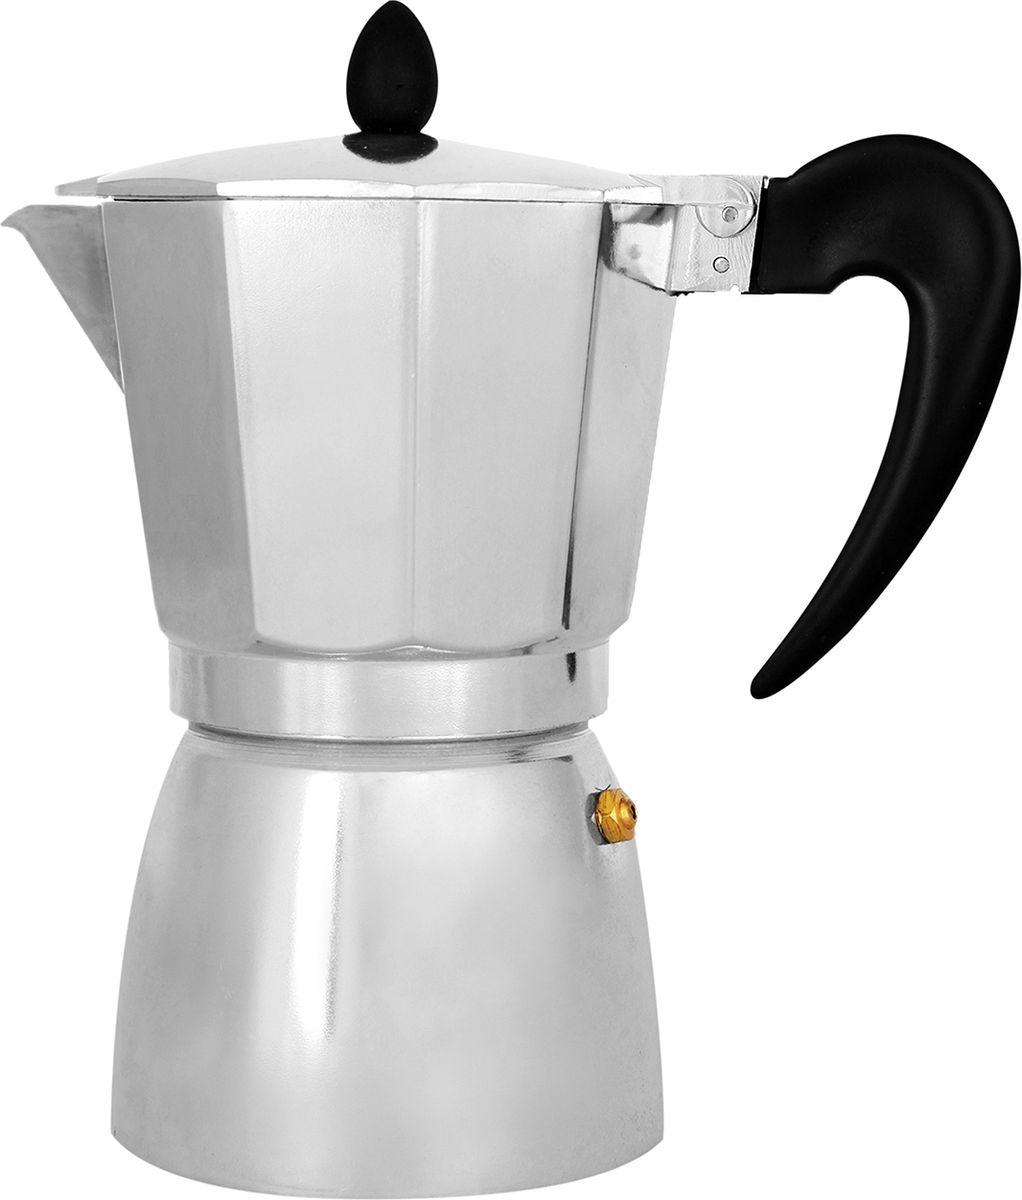 Кофеварка гейзерная Italco Soft, 275600, серый, на 6 чашек гейзерная кофеварка italco express алюминий